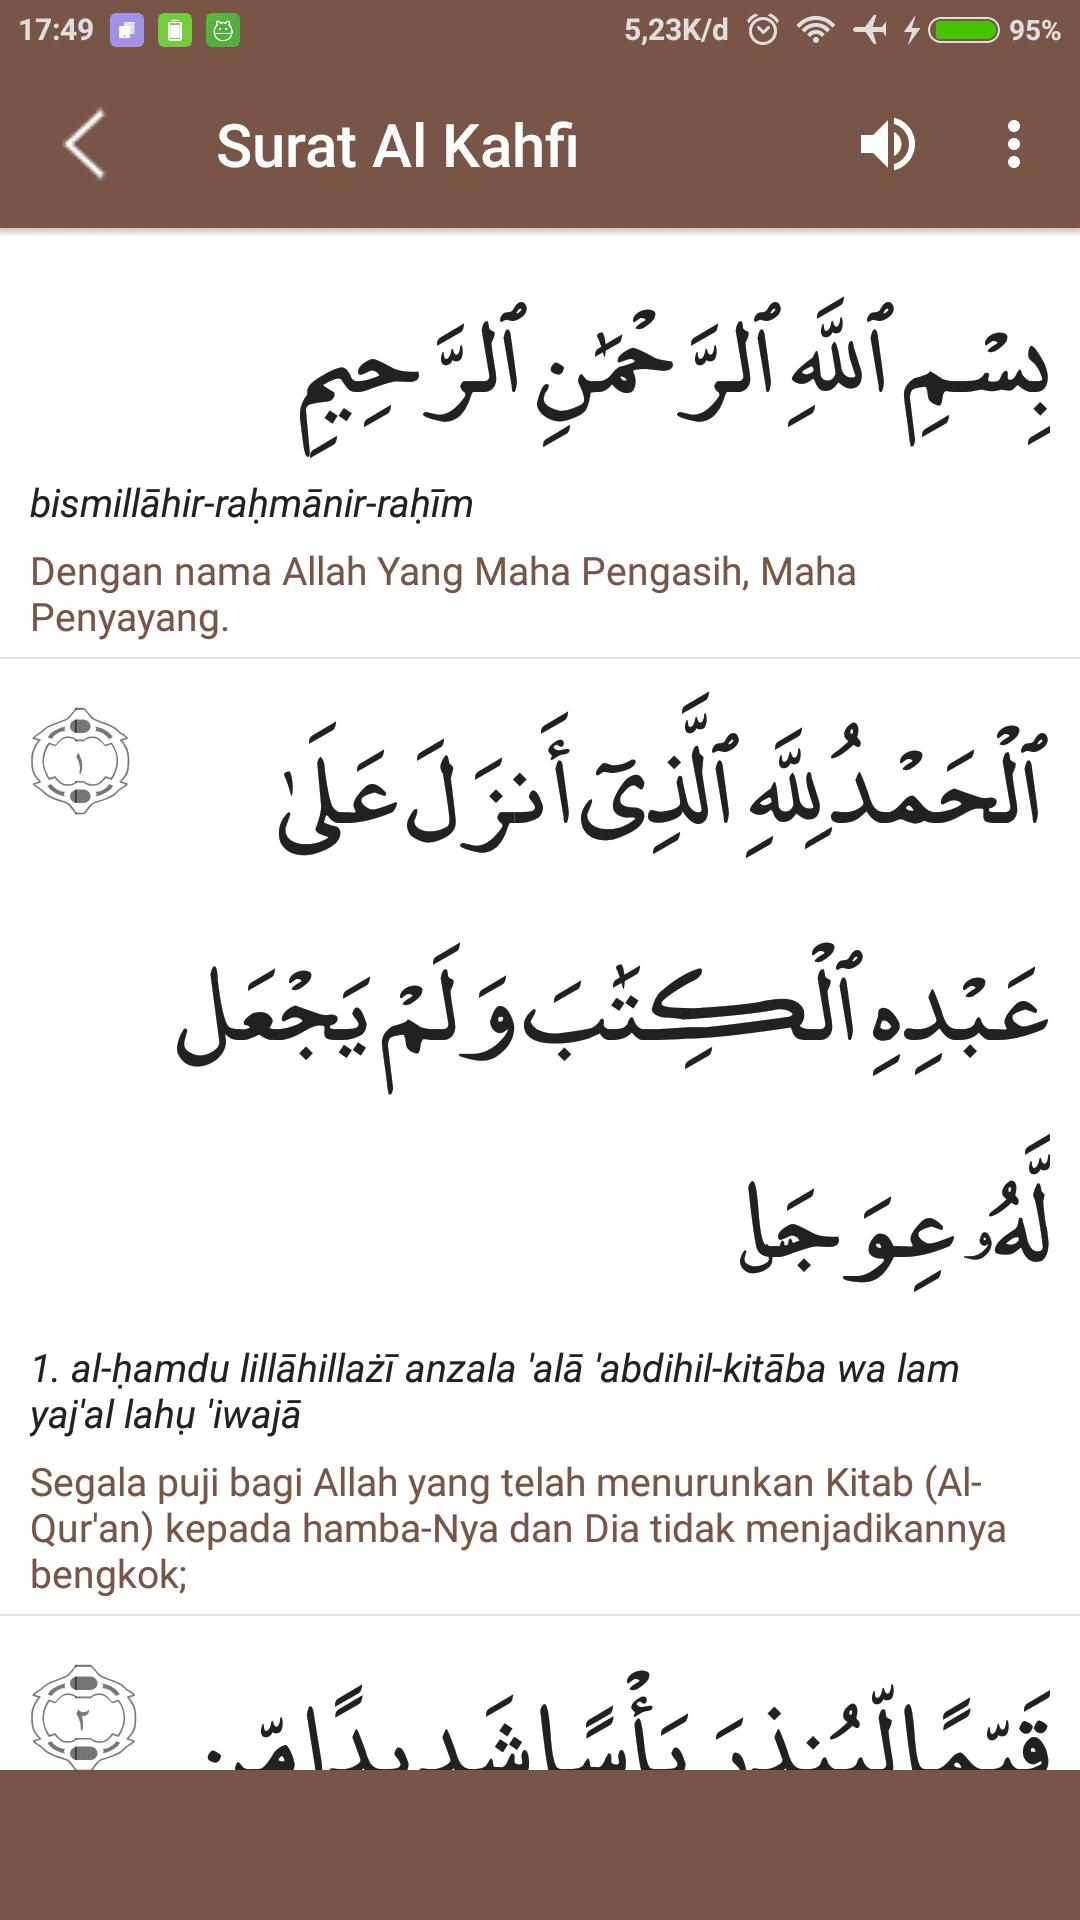 Surat Al Kahfi For Android Apk Download